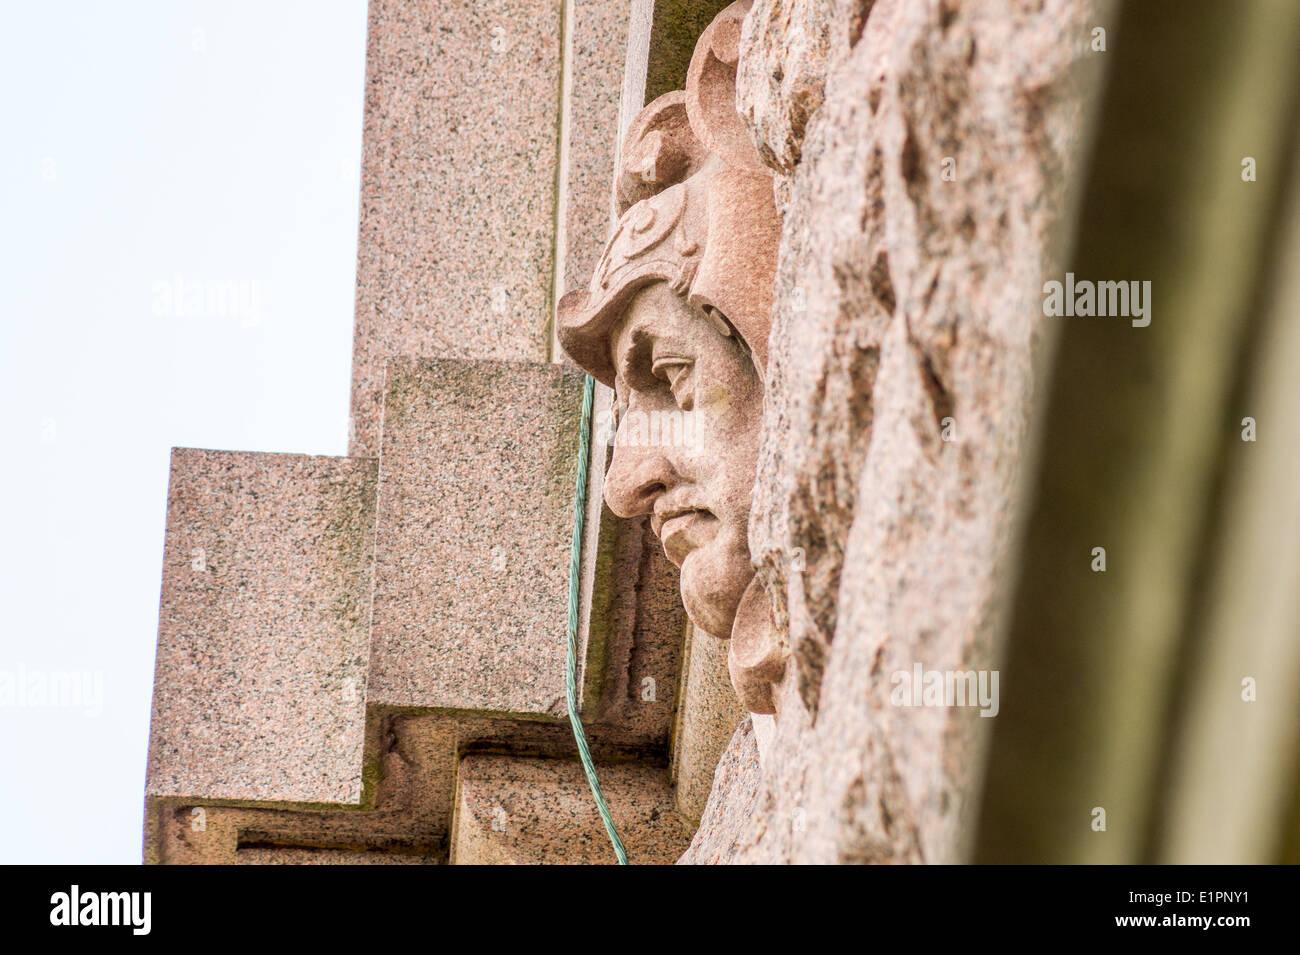 Cabeza humana estatua salían de una pared Imagen De Stock